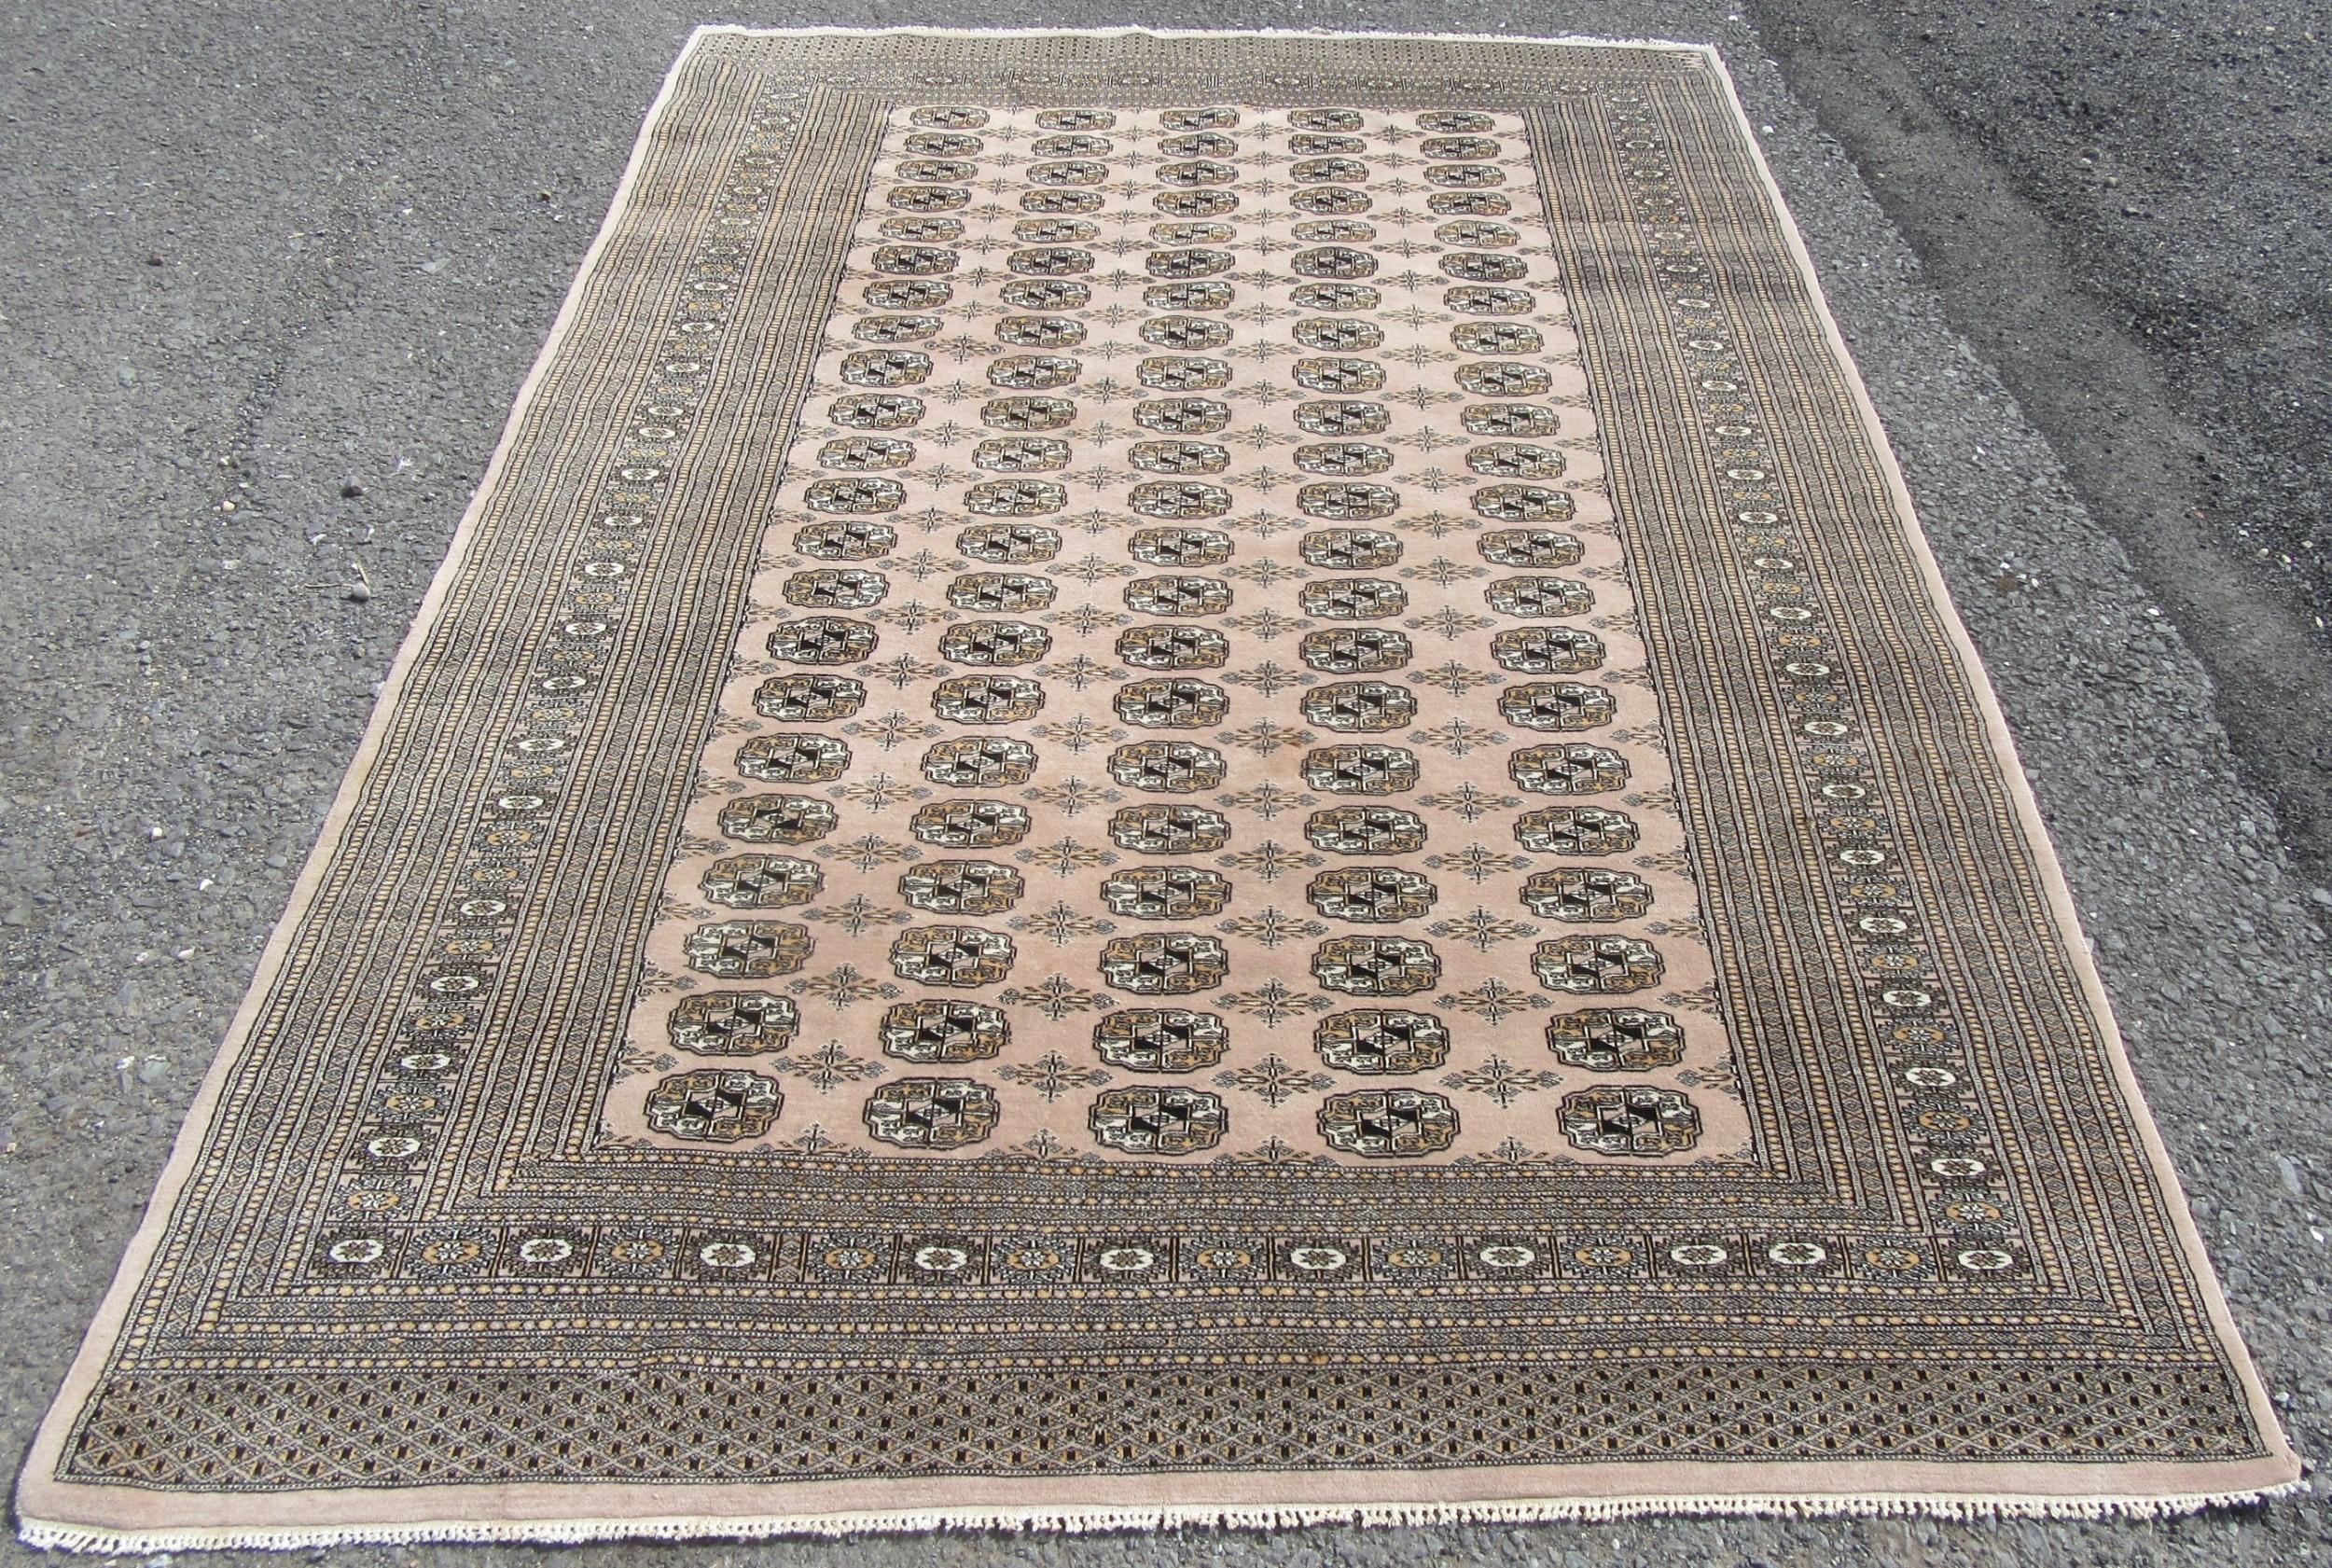 large attractive vintage indian woollen carpet rug 269cm x 190cm